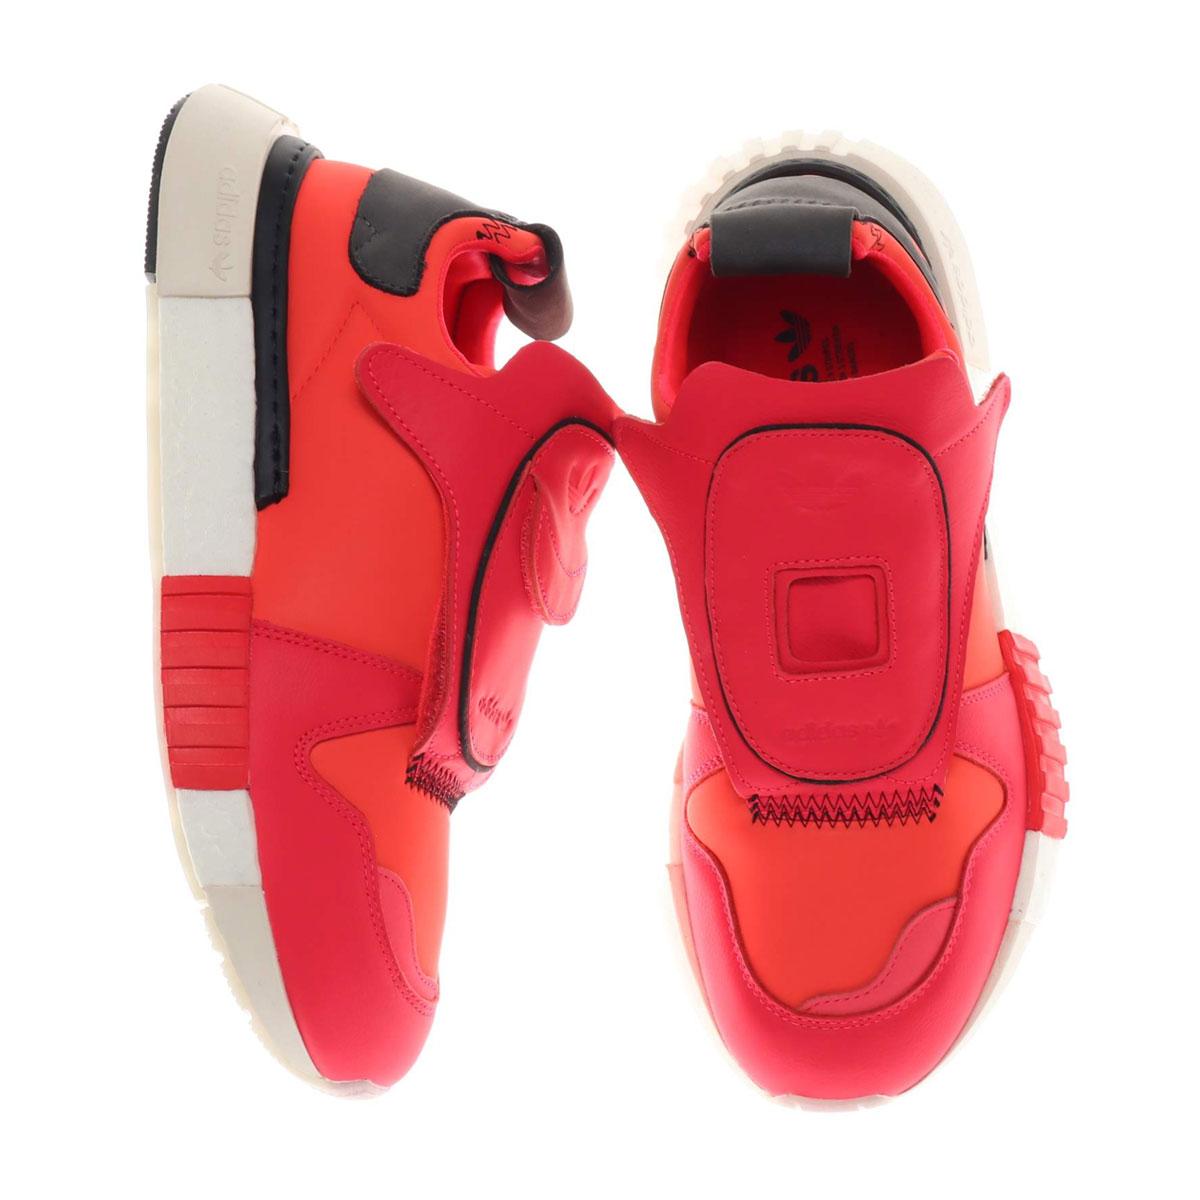 adidas Originals FUTUREPACER (アディダスオリジナルス フューチャーペーサー)SHOCK RED/SHOCK RED/SHOCK RED【メンズ スニーカー】19SS-I